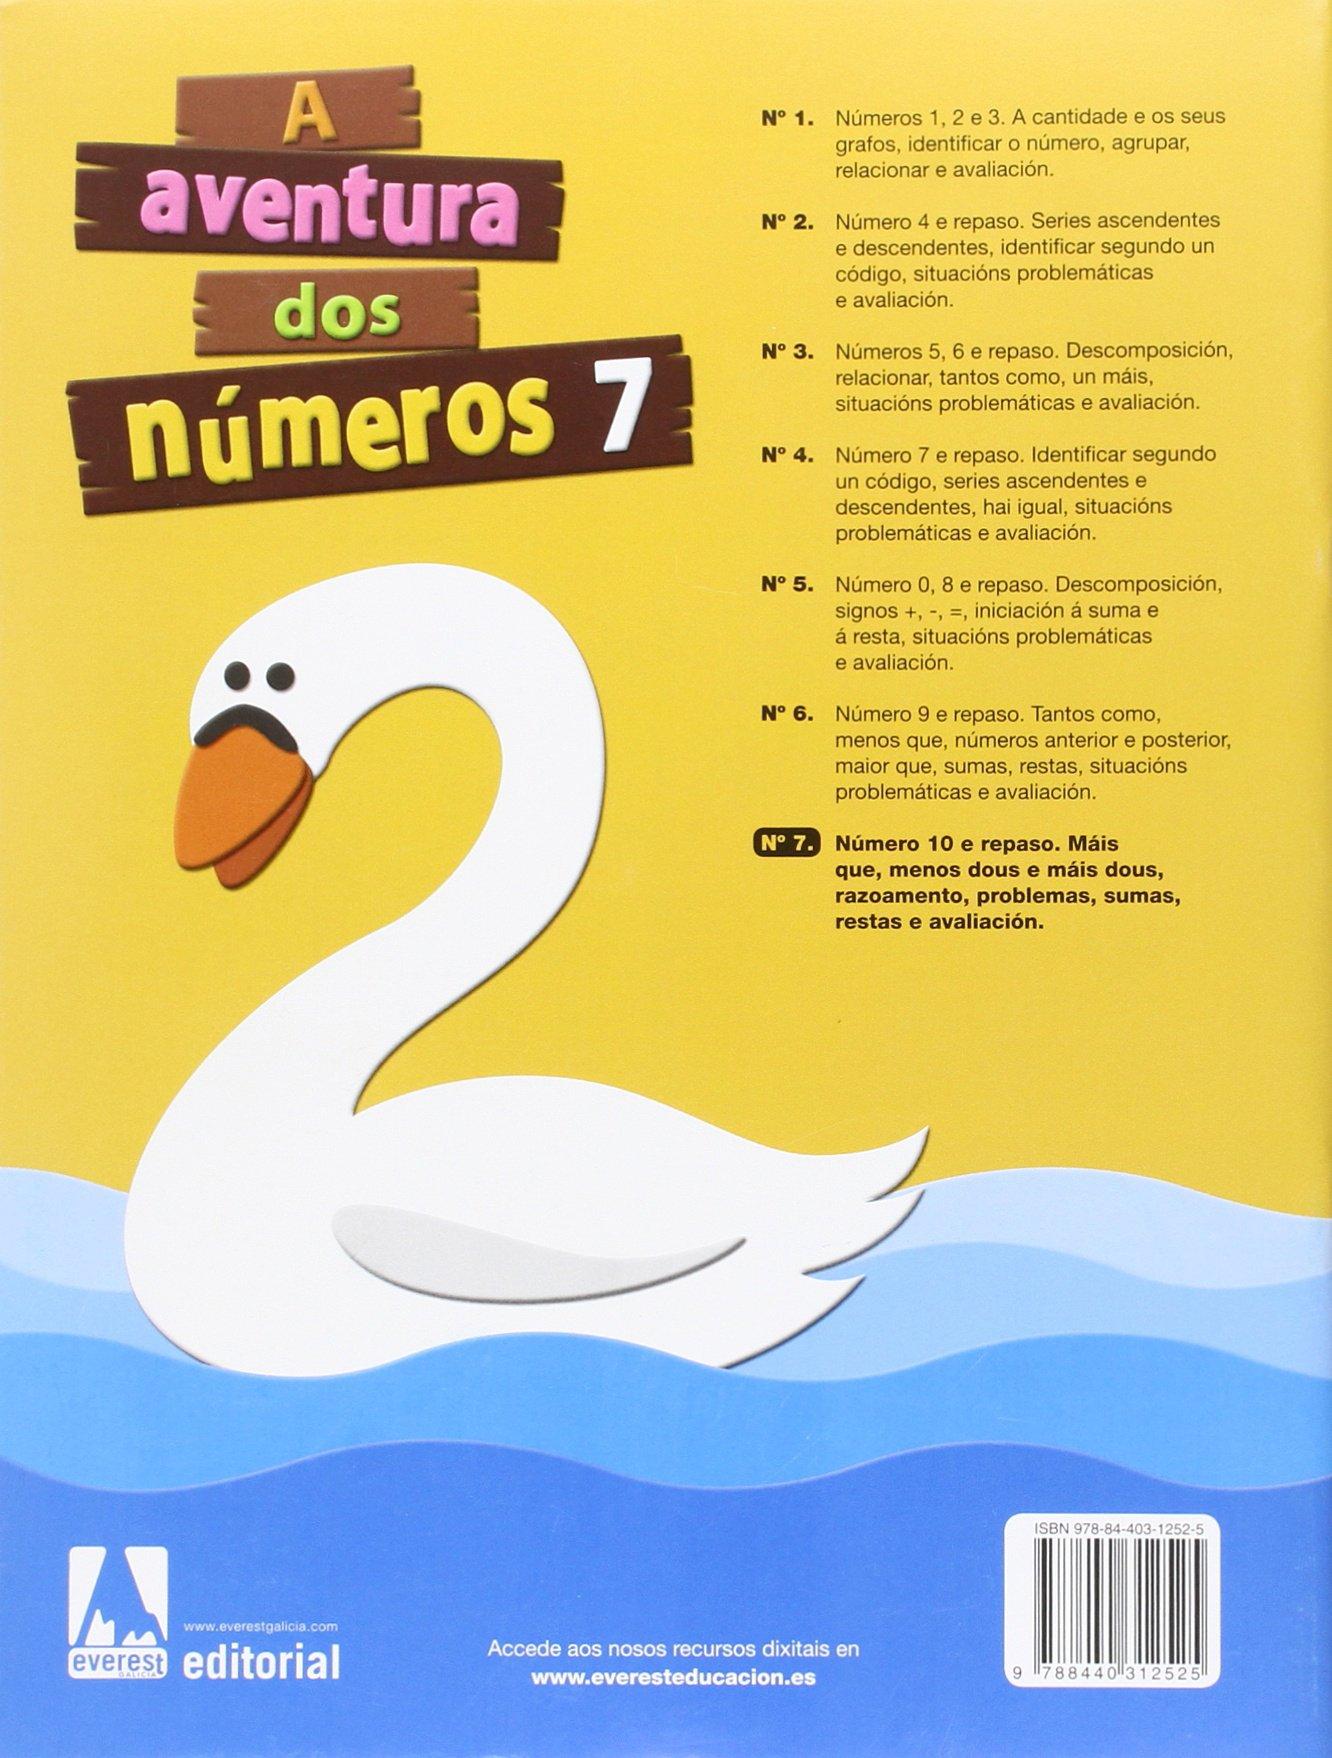 A aventura dos números 7 - 9788440312525: Amazon.es: Díez Torío Ana María,  Estébanez Estébanez Aurora, Calvo Rojo María del Carmen, Anievas Alfredo,  ...